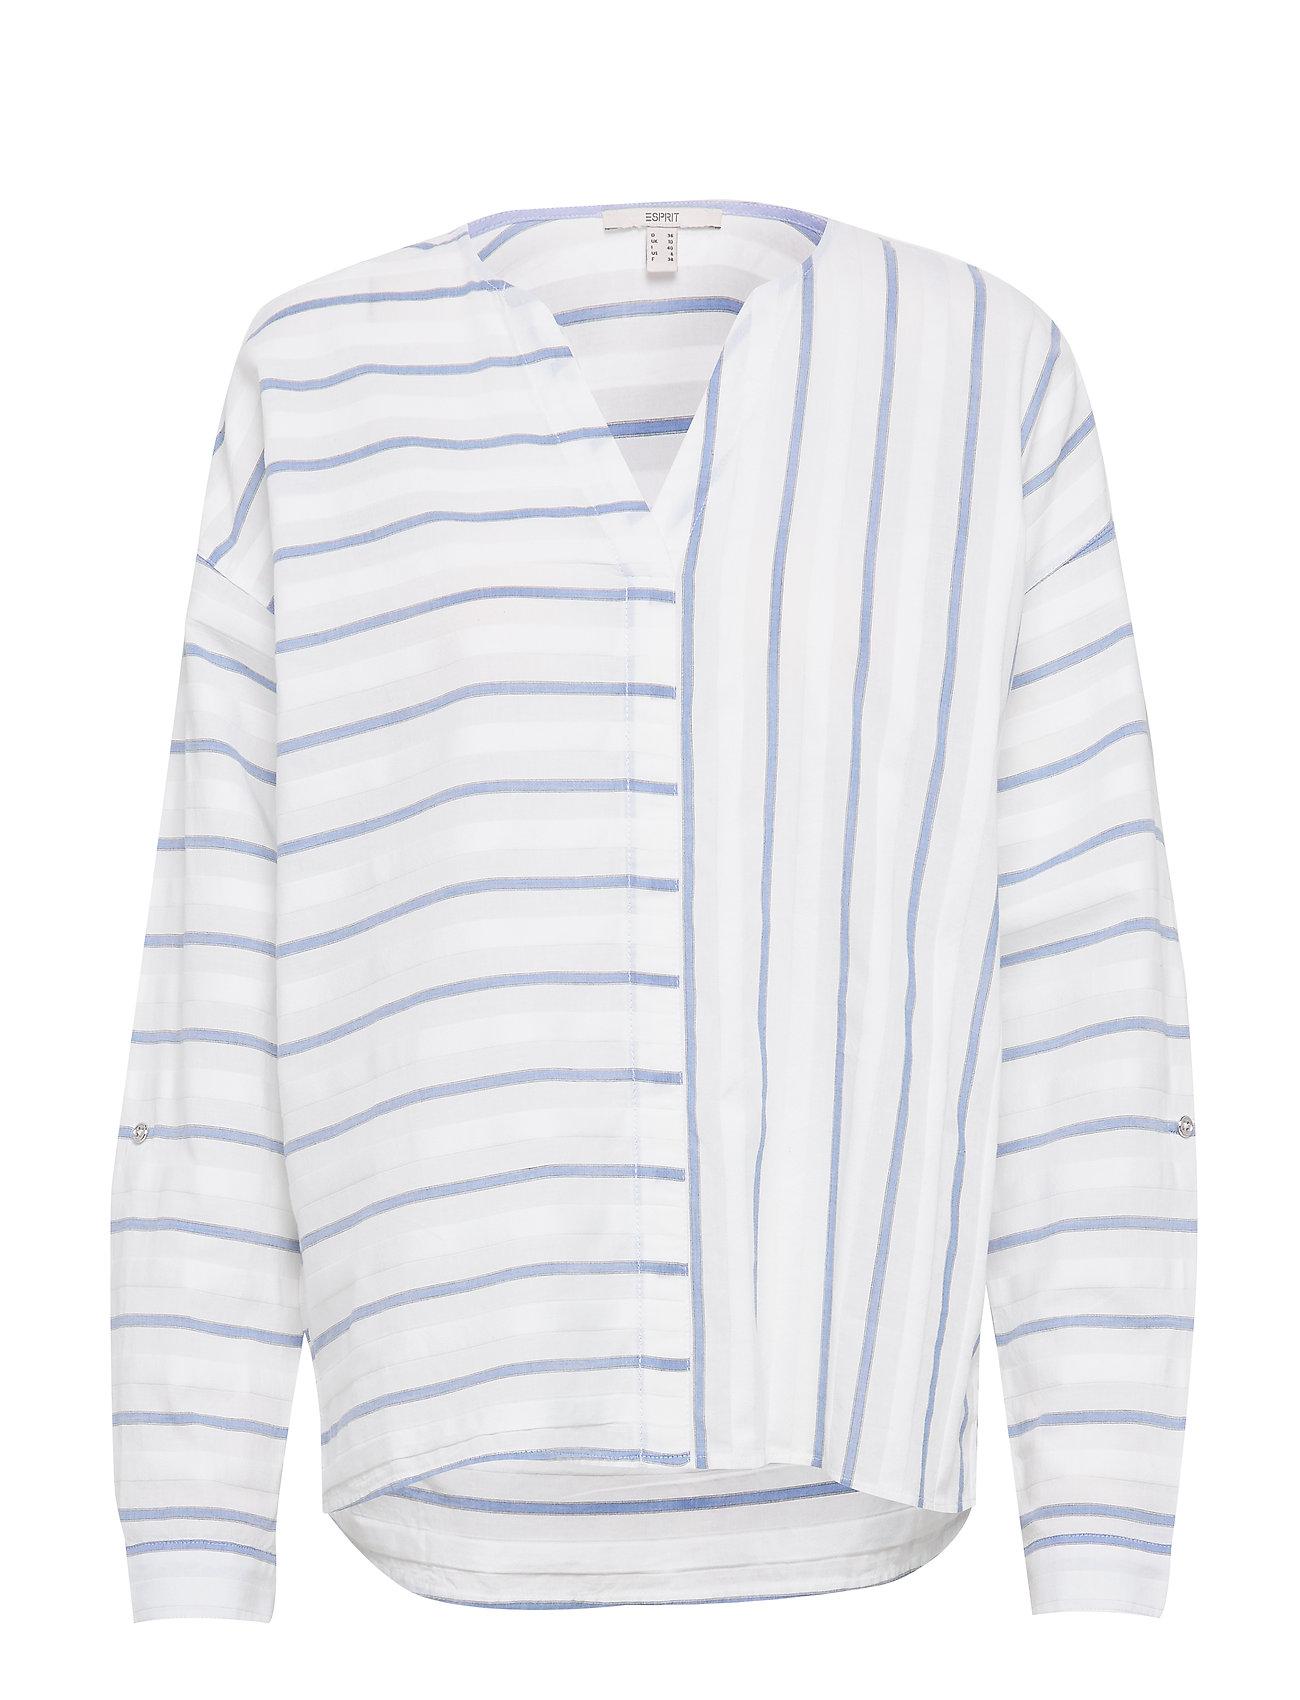 Esprit Casual Blouses woven - WHITE